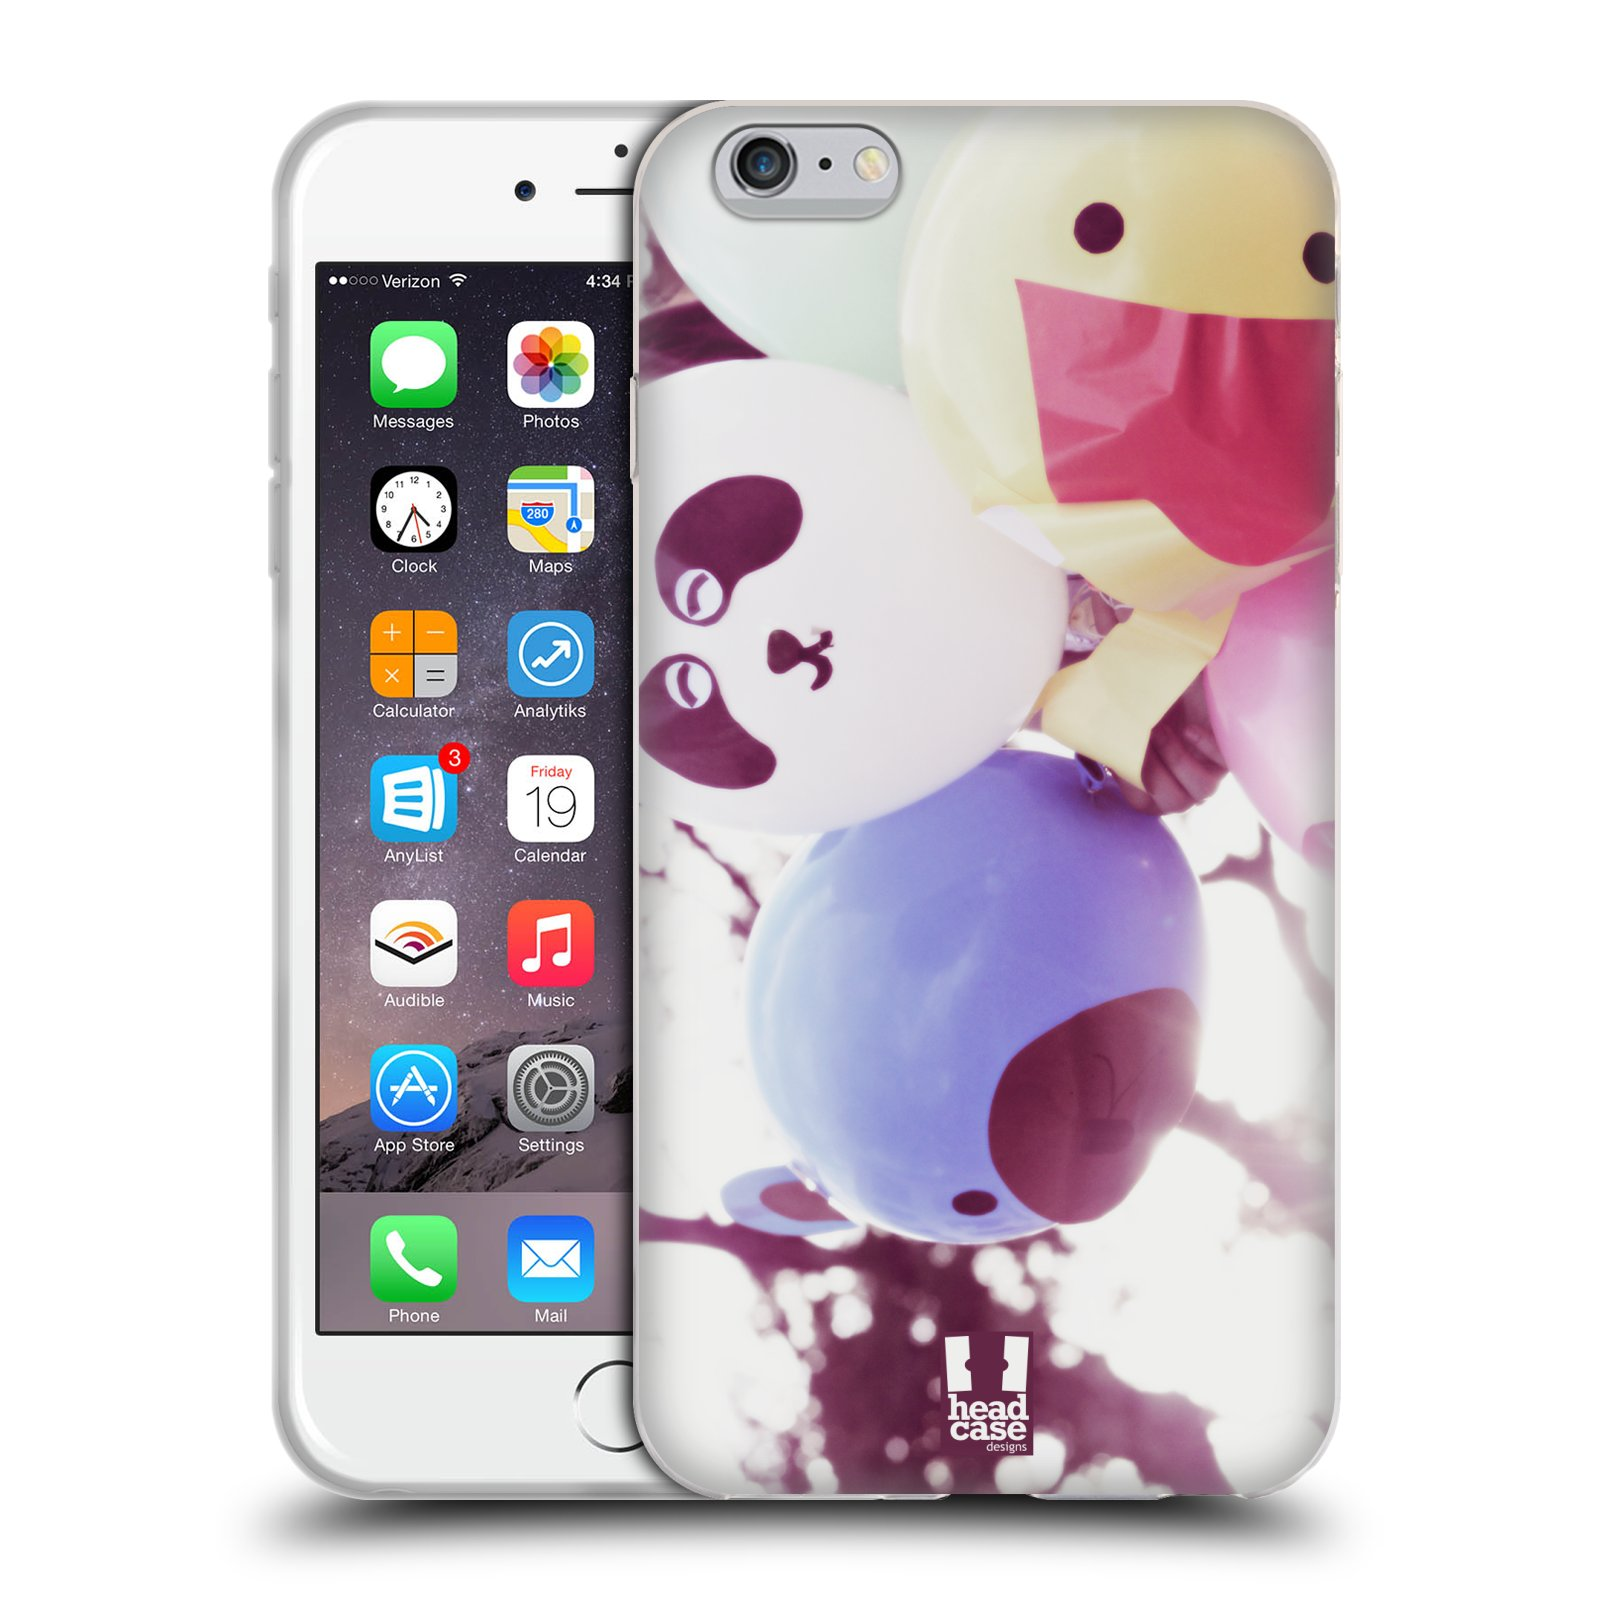 HEAD CASE silikonový obal na mobil Apple Iphone 6 PLUS/ 6S PLUS vzor Balónková zvířátka foto sen